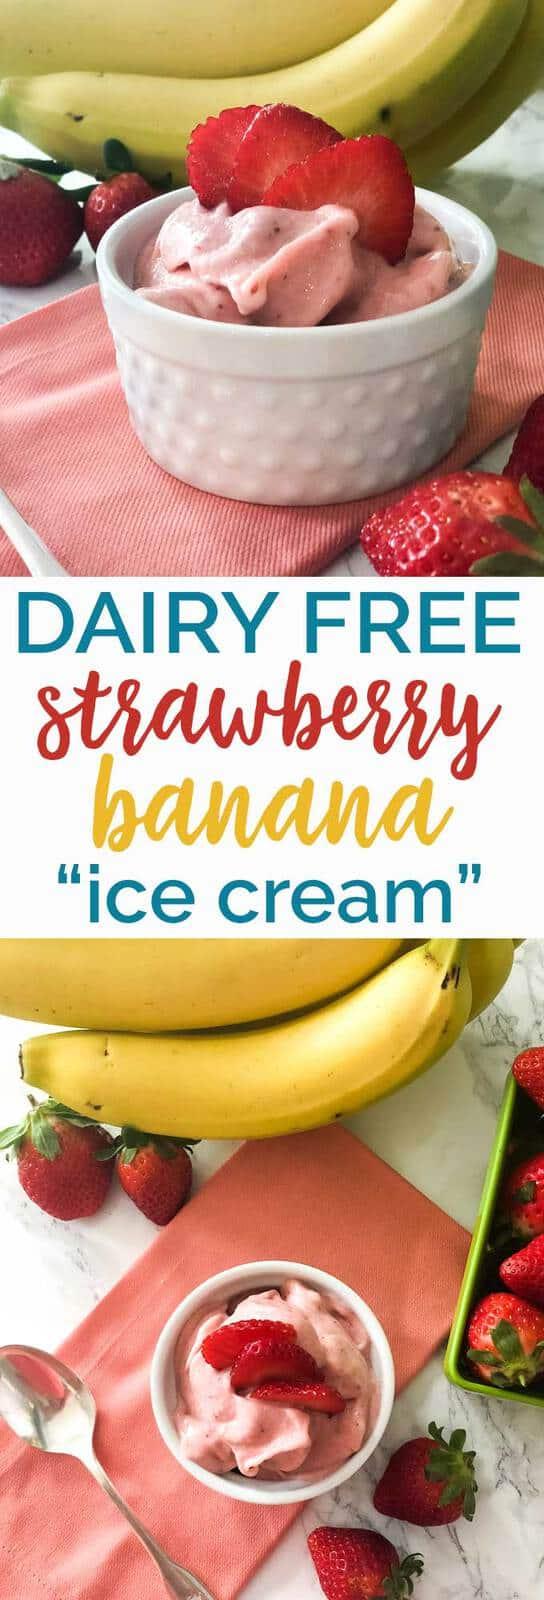 Delicious Dairy Free Sugar Free Strawberry Banana